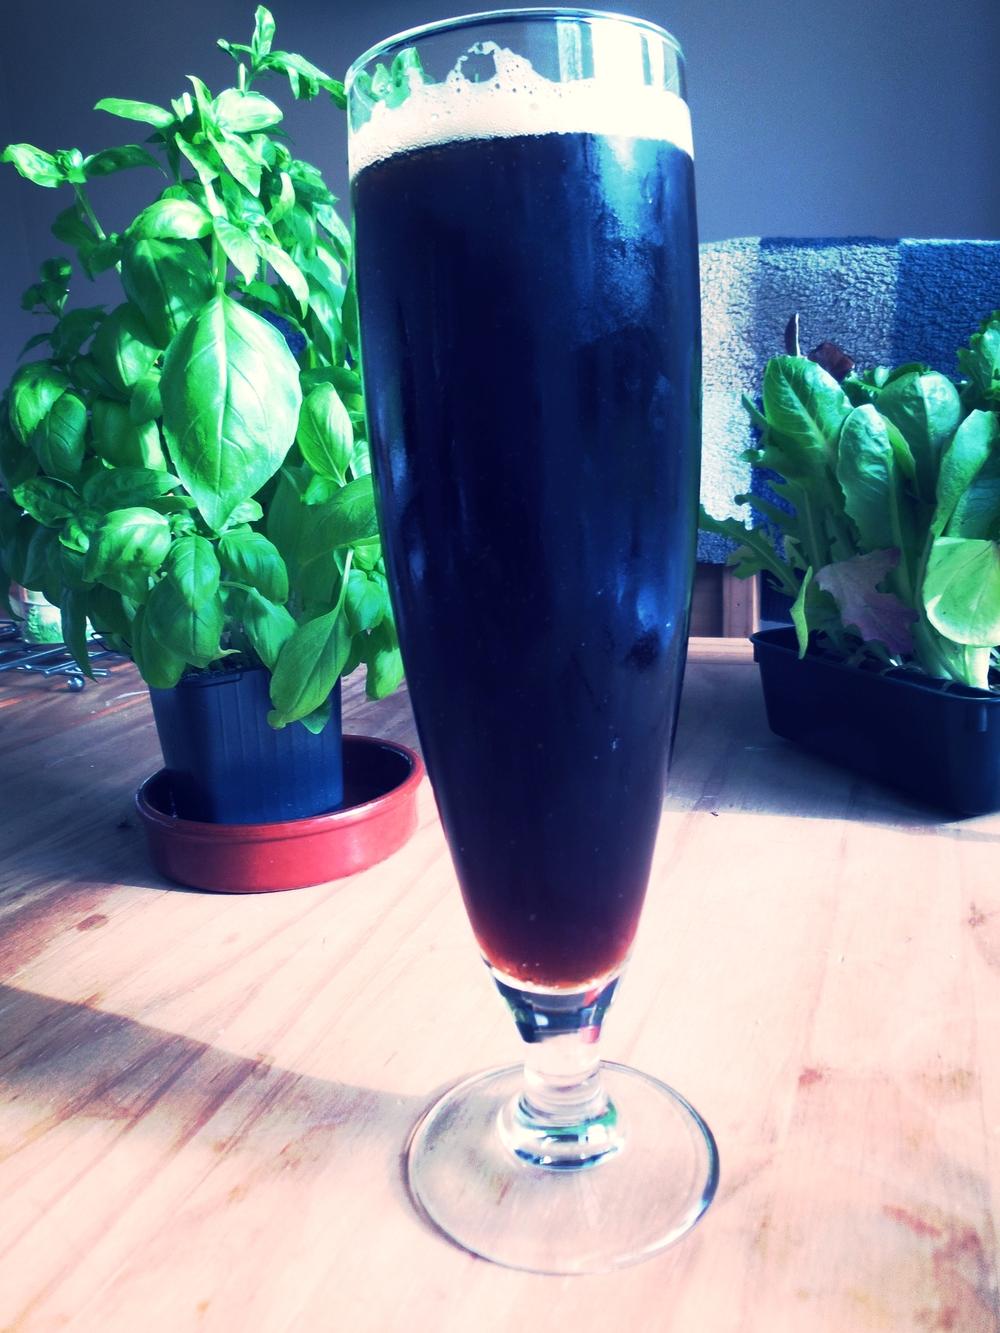 Dark, Malty lager, Fine bubbles, Light tan head - check  Arty vegetation - check